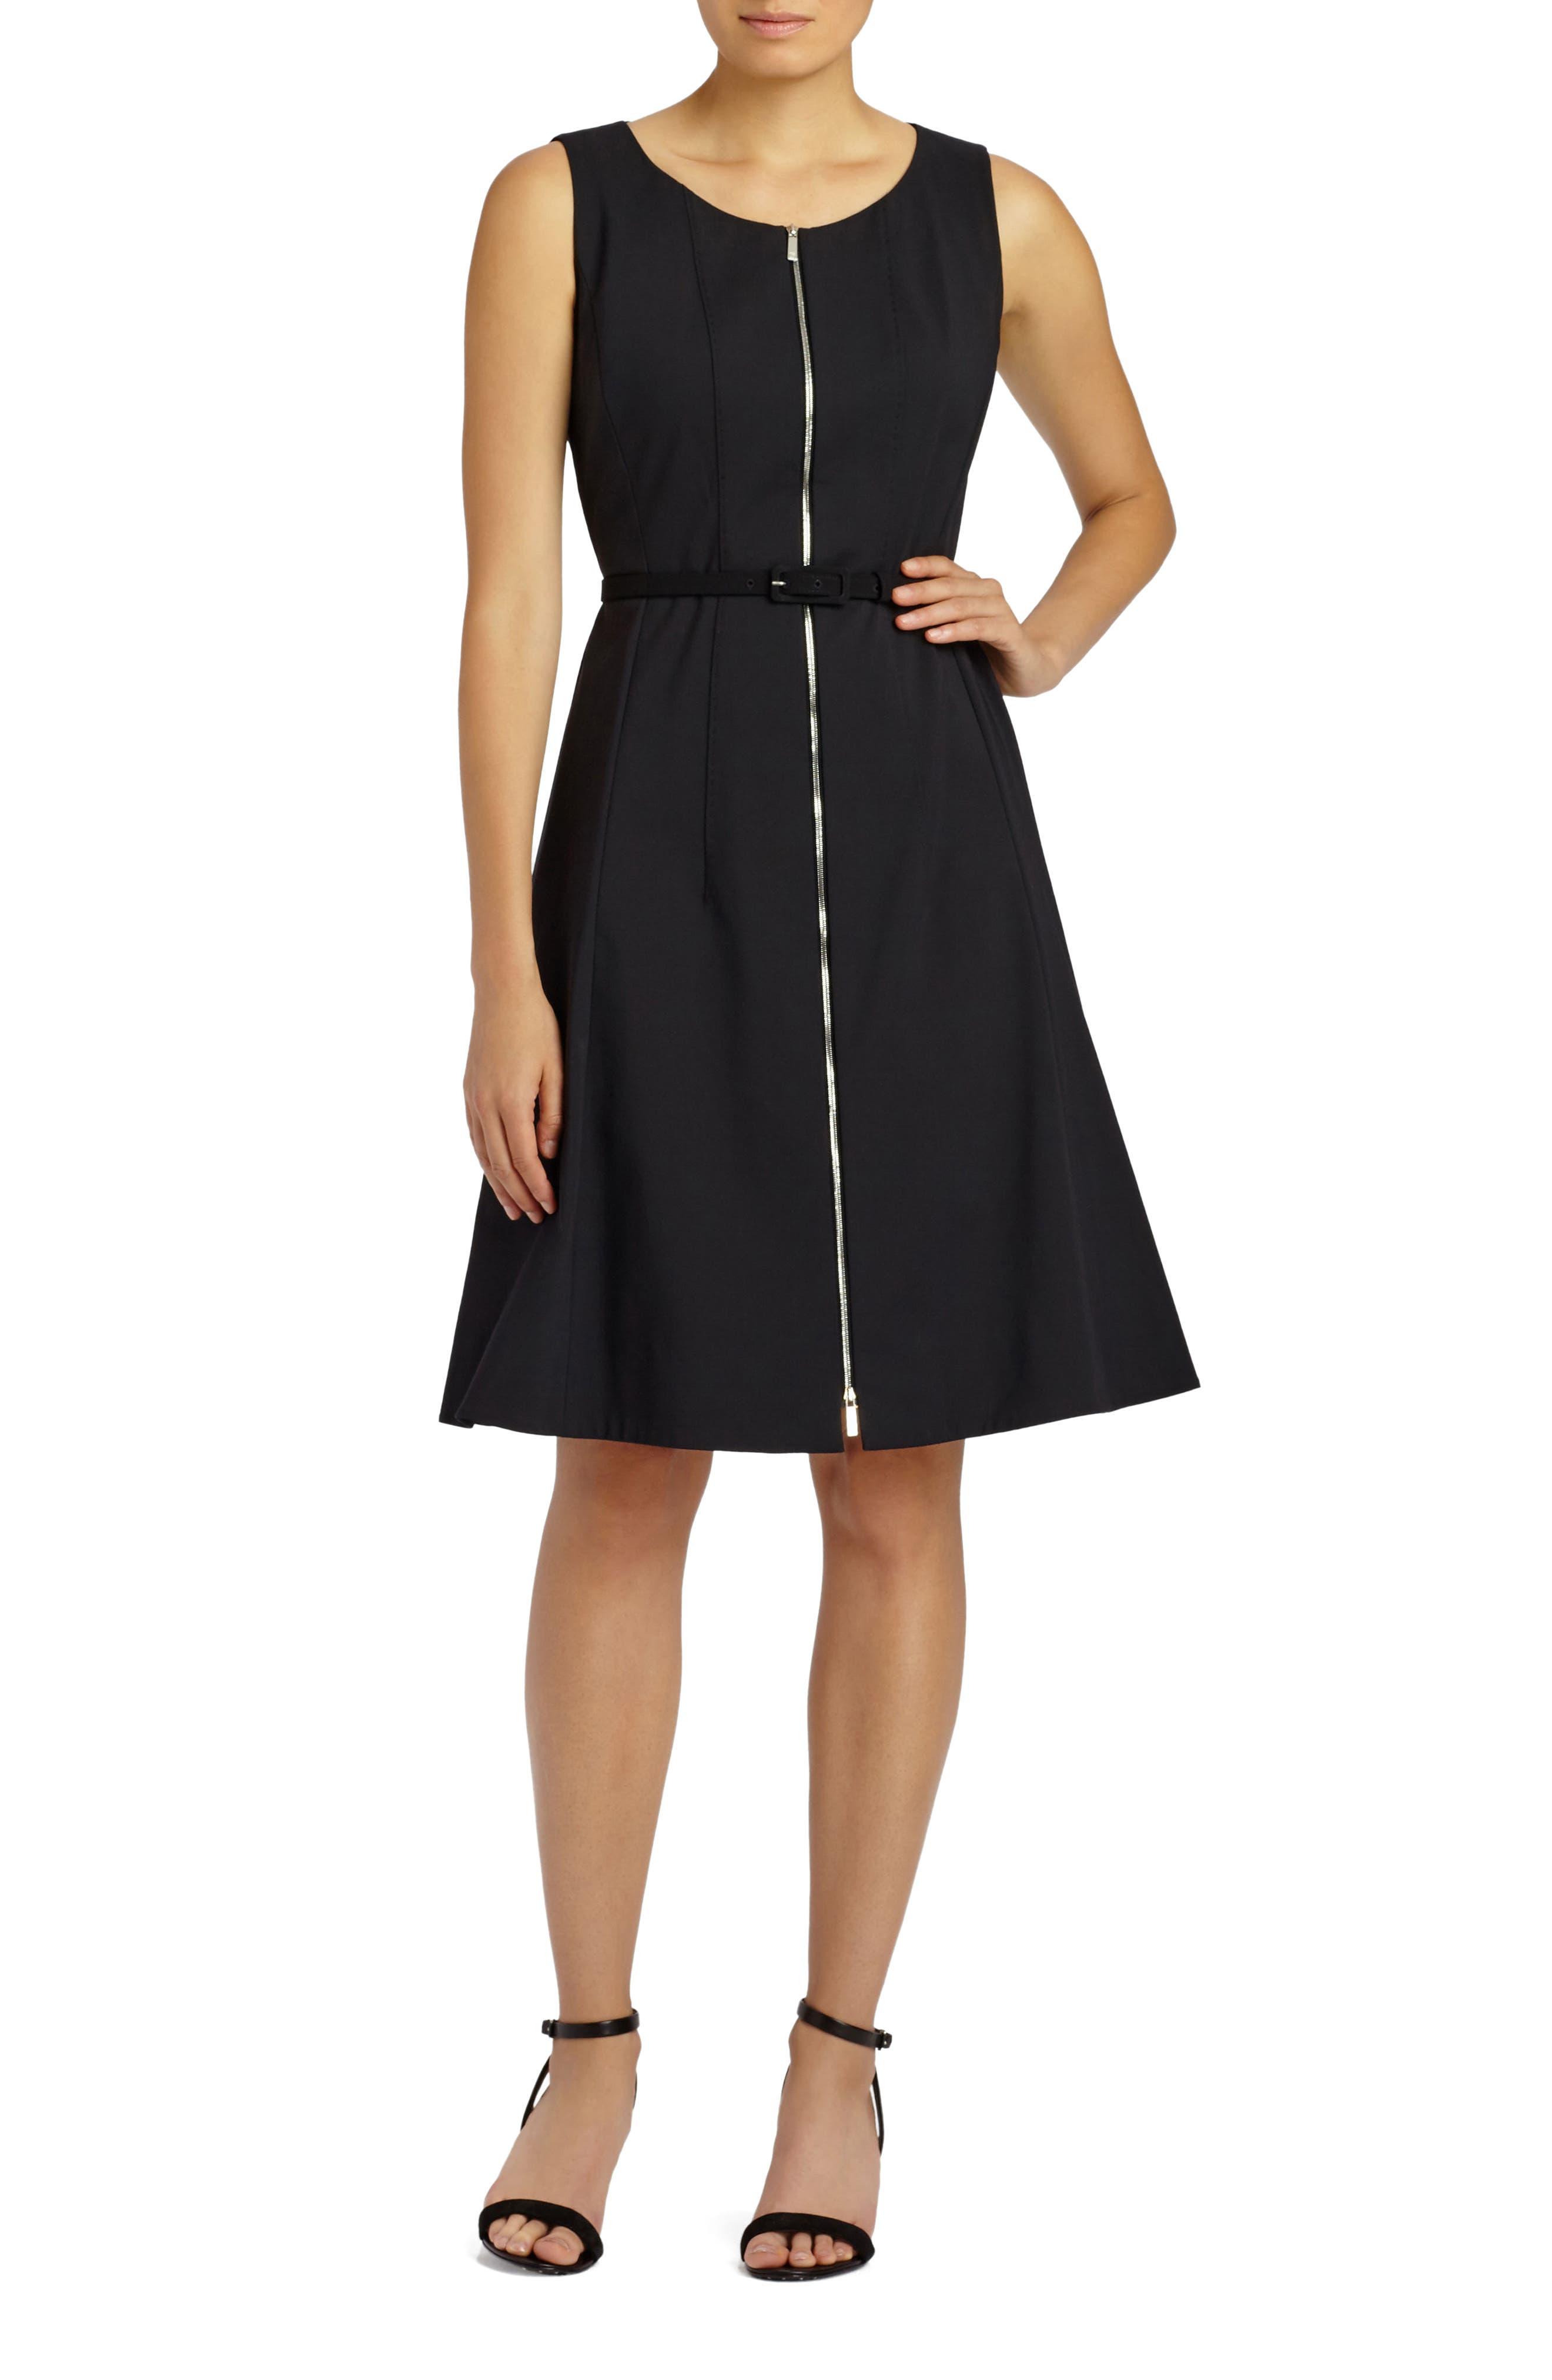 Alternate Image 1 Selected - Lafayette 148 New York Coralie Belted Fundamental Bi-Stretch Dress